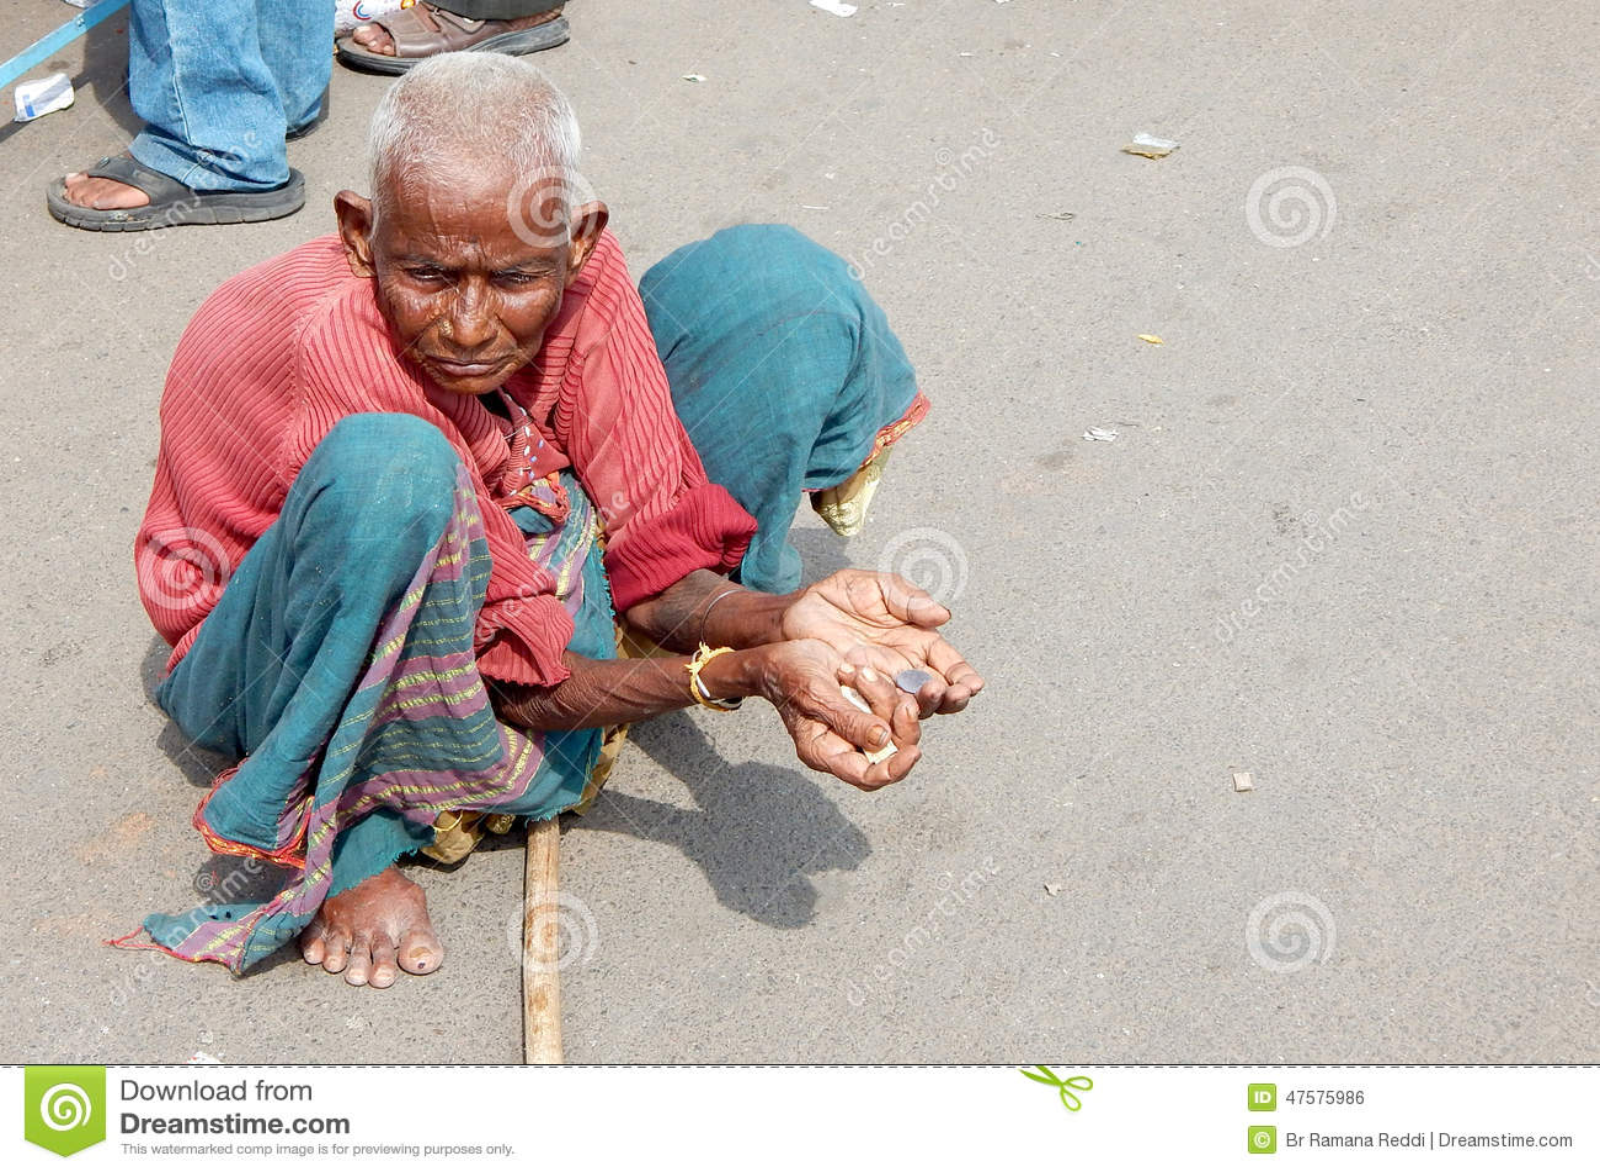 recherche femme indienne femme cherche homme villefranche sur saone